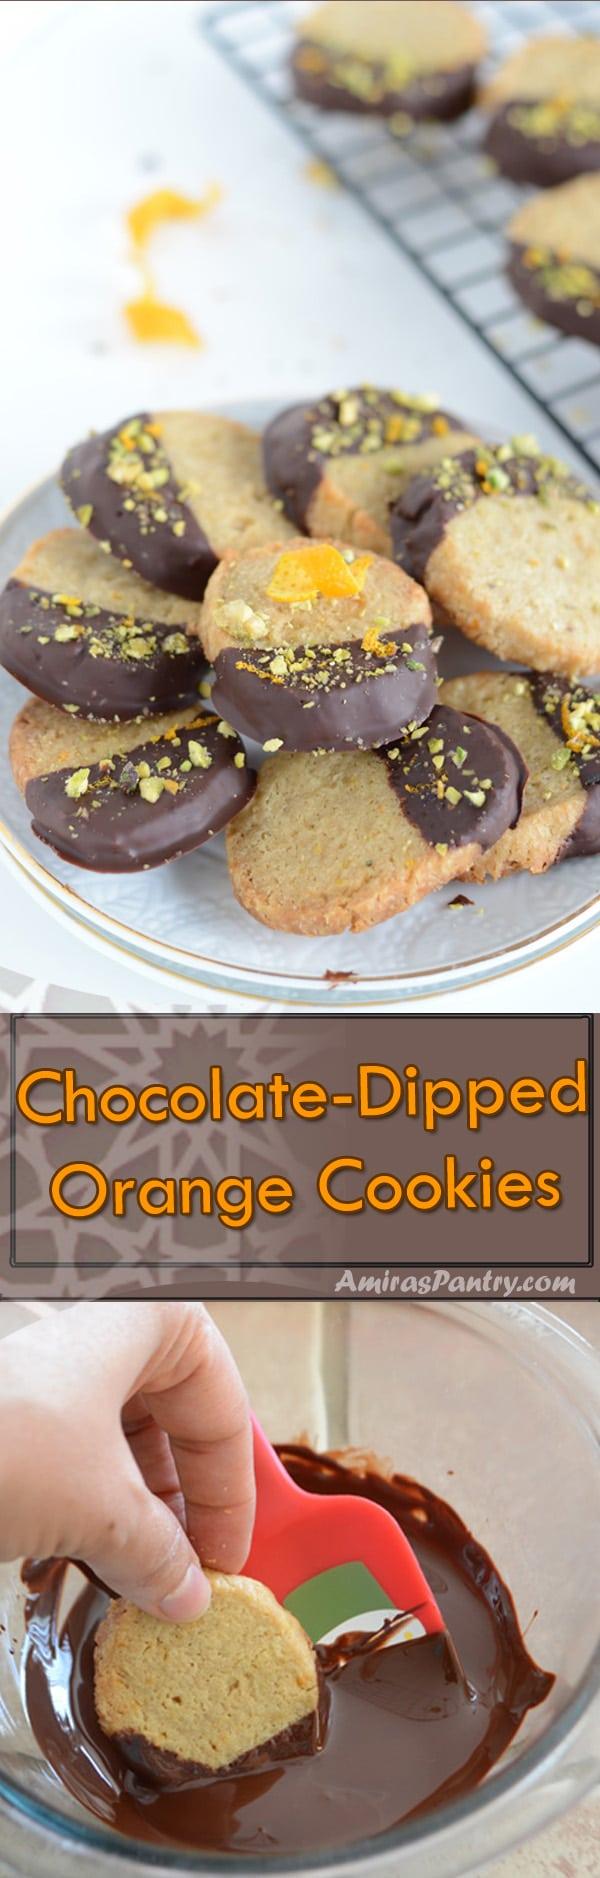 Chocolate-dipped Orange cookies | Amira's Pantry